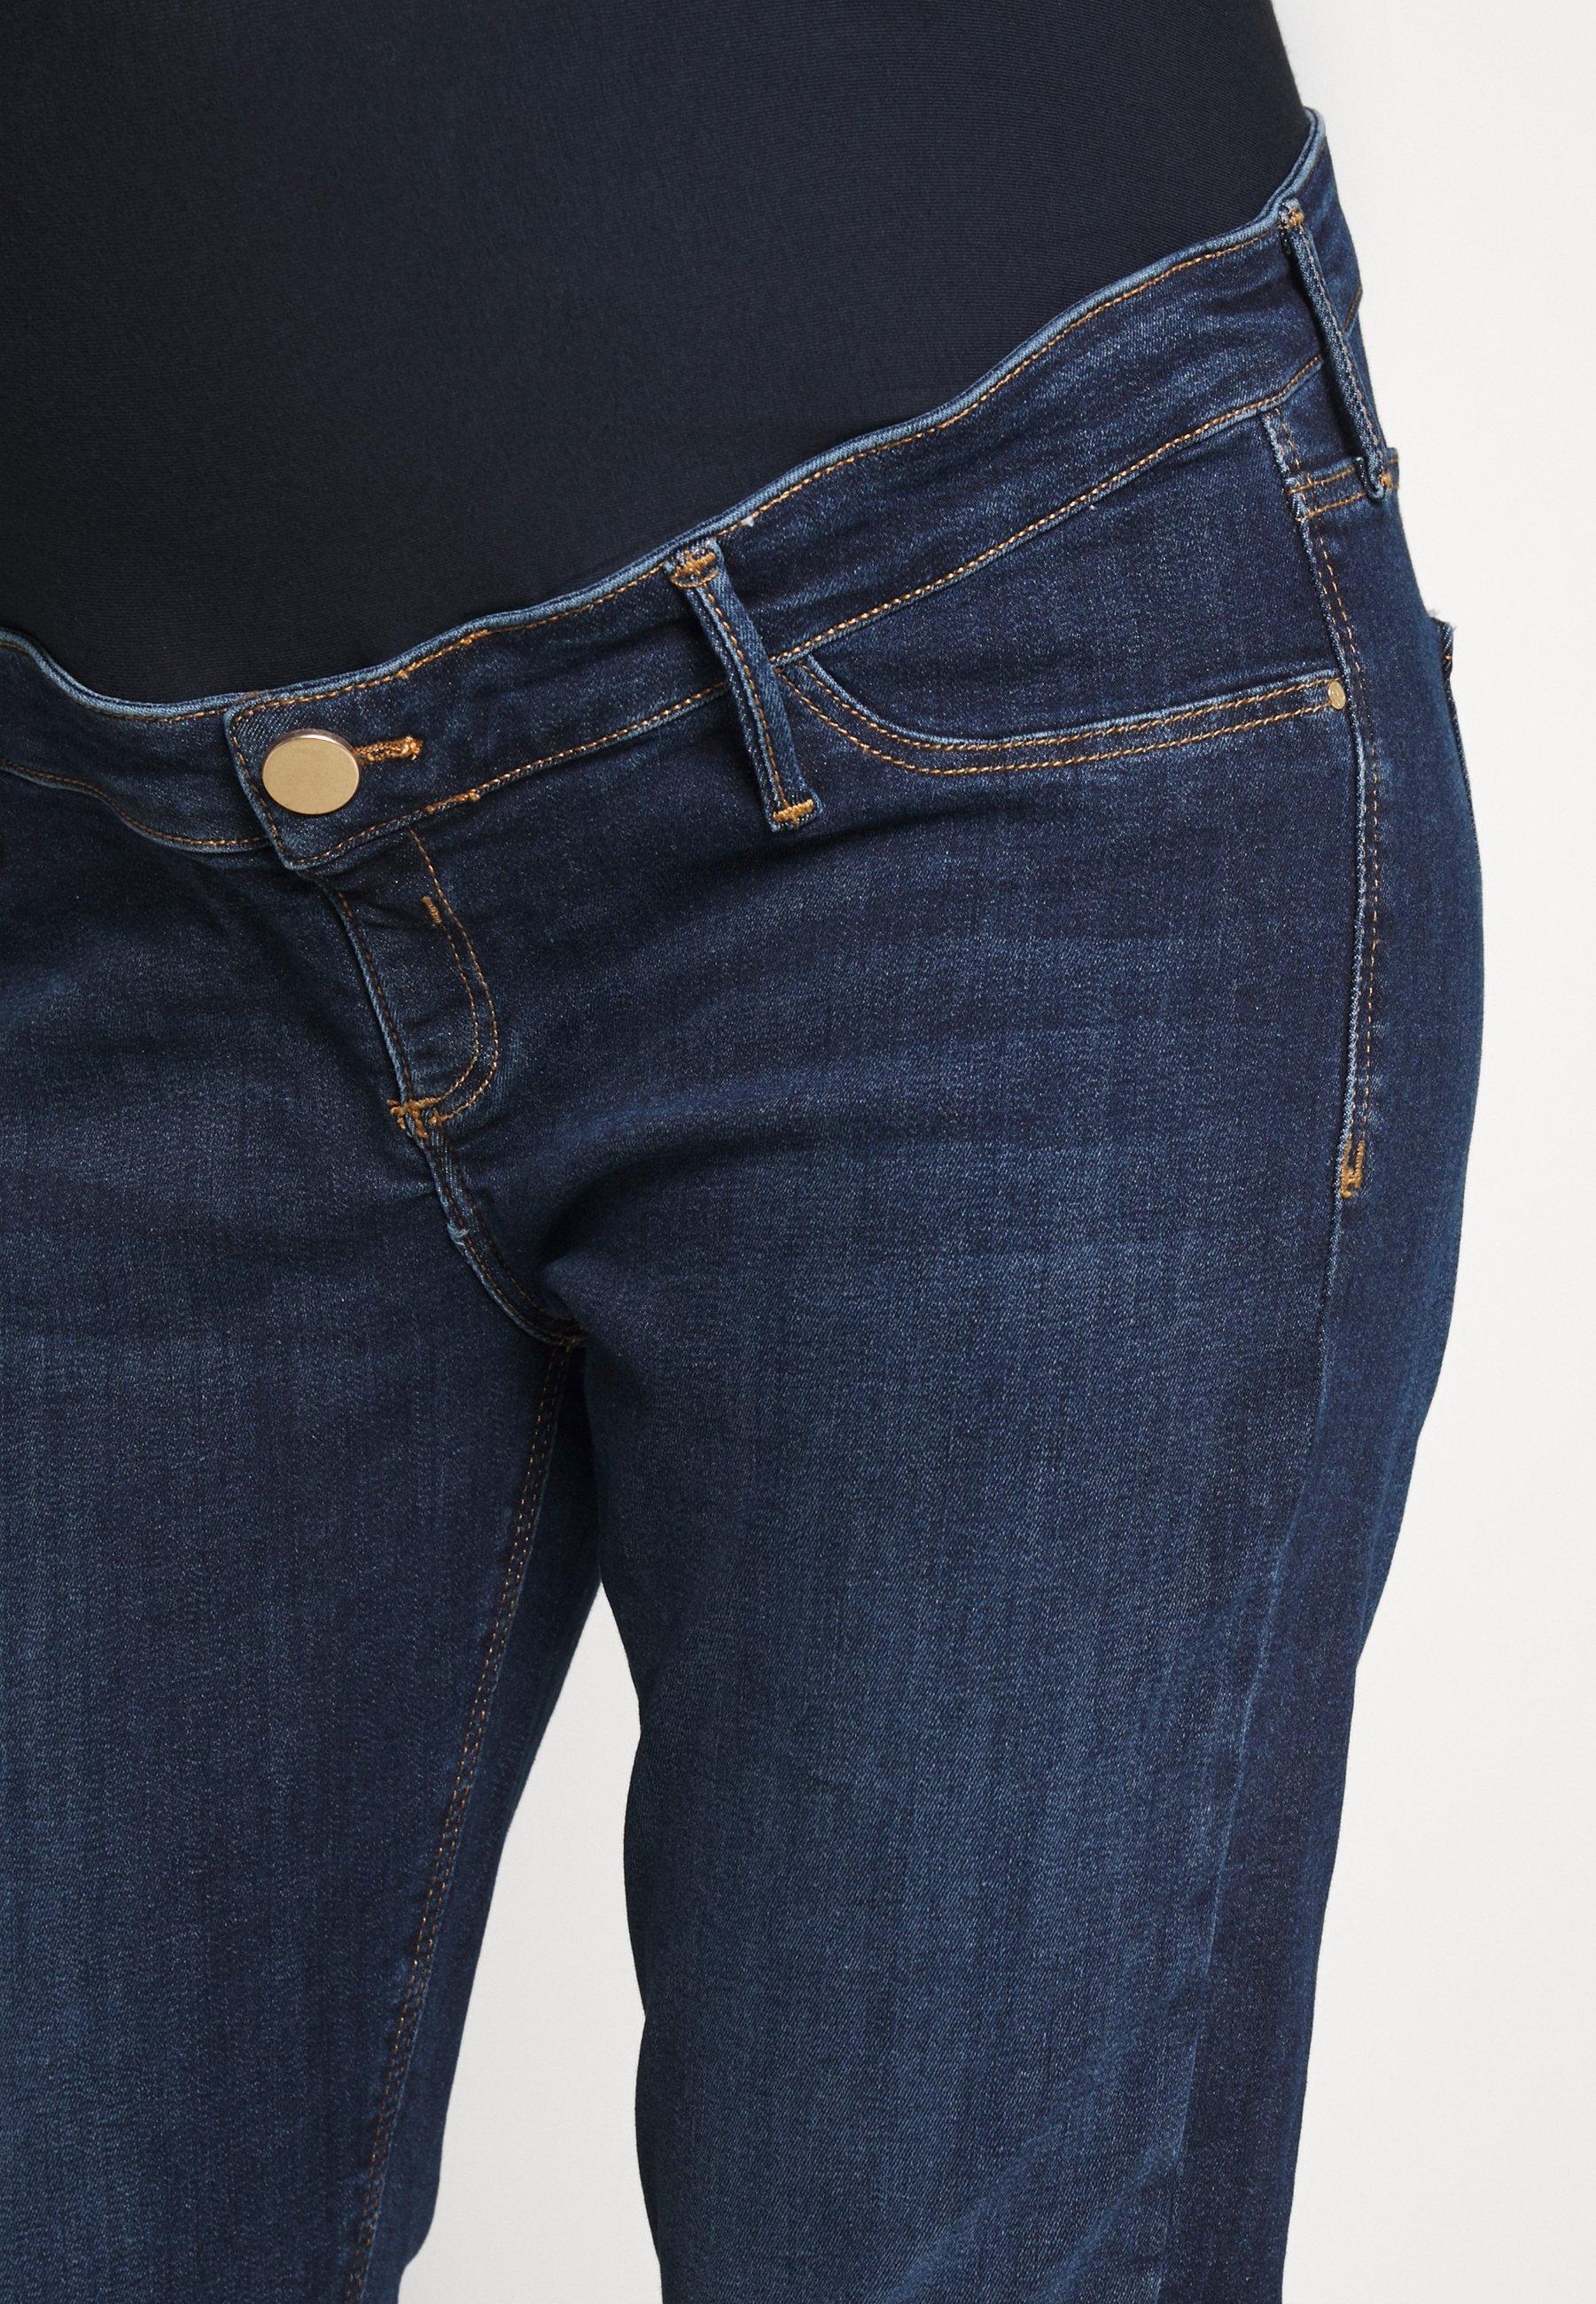 River Island Maternity MOLLY  - Jeans Skinny - dark auth - Jeans Femme JOzXA